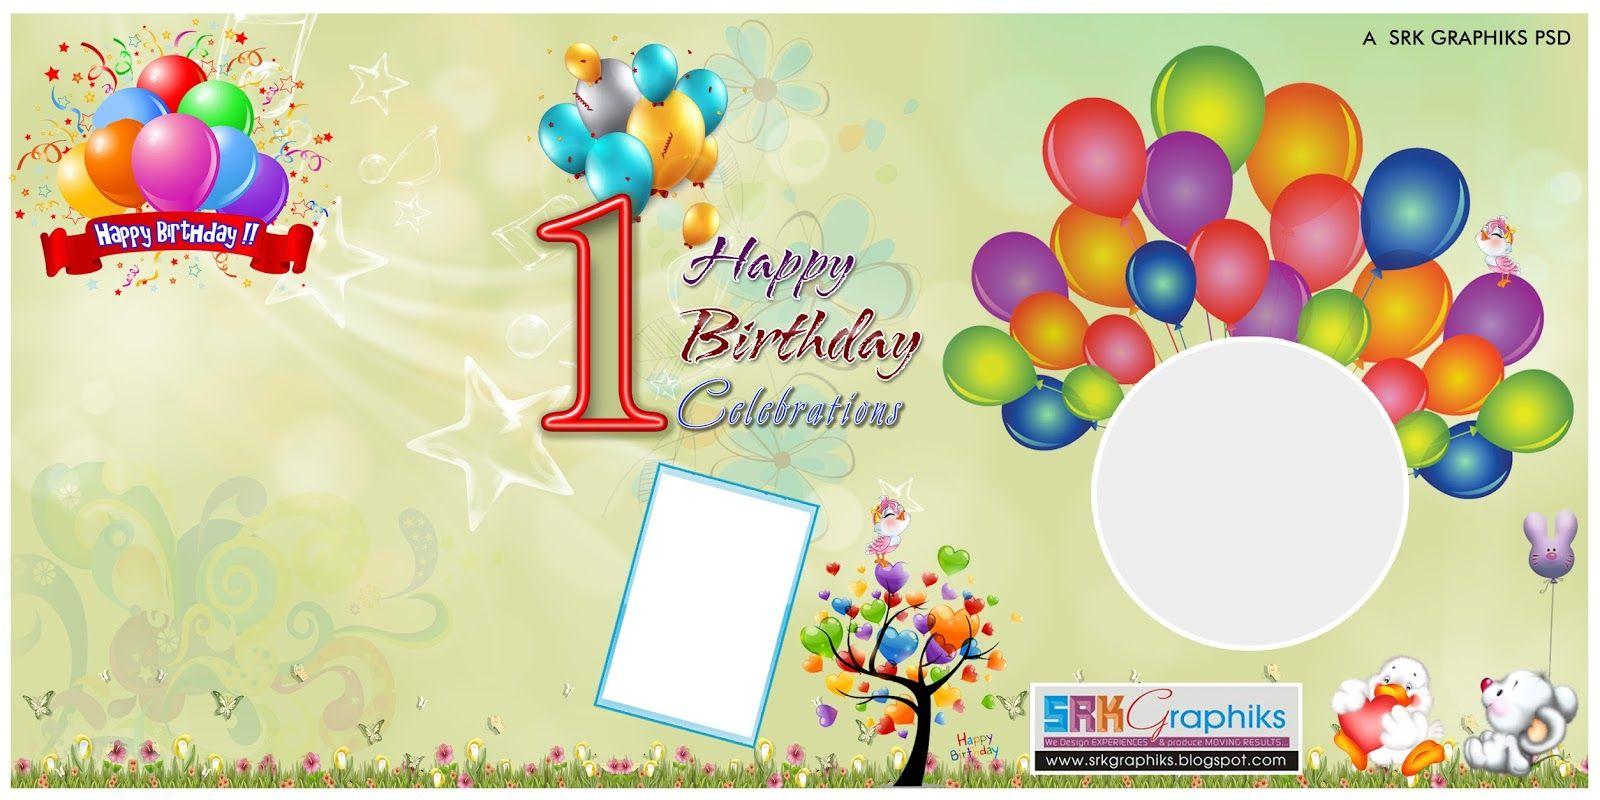 5c39710jpg 1600800 pixels birthday banner design